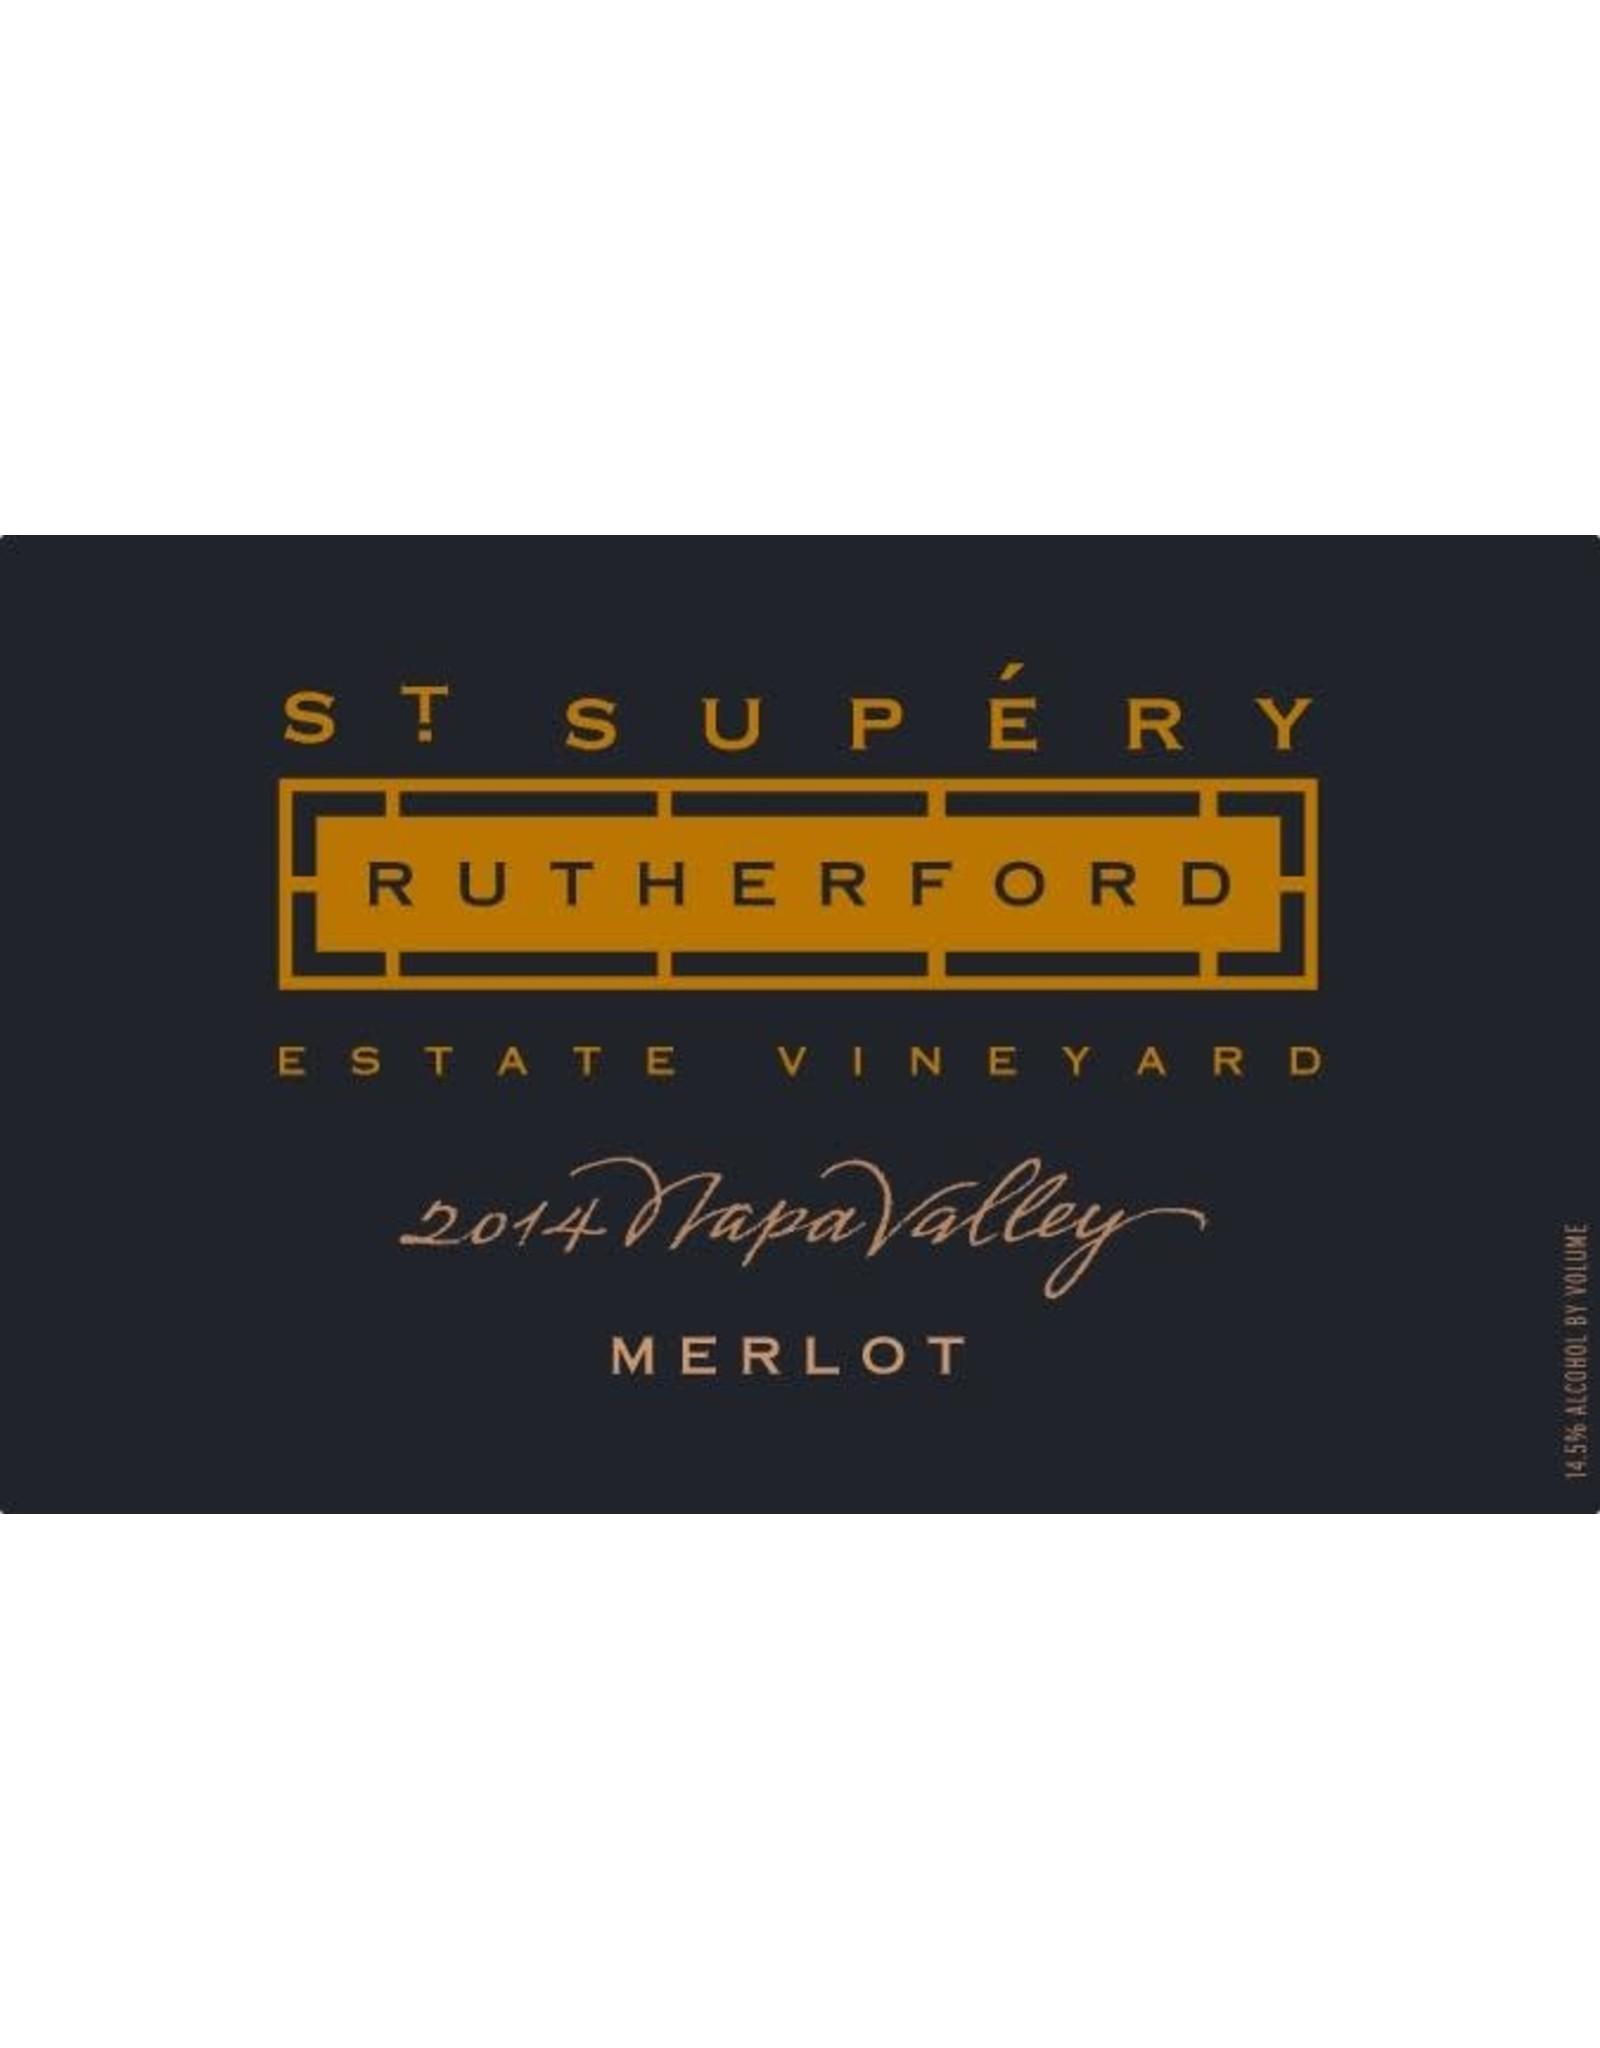 St. Supery Vineyards St. Supery Vineyards Merlot Rutherford (2009)